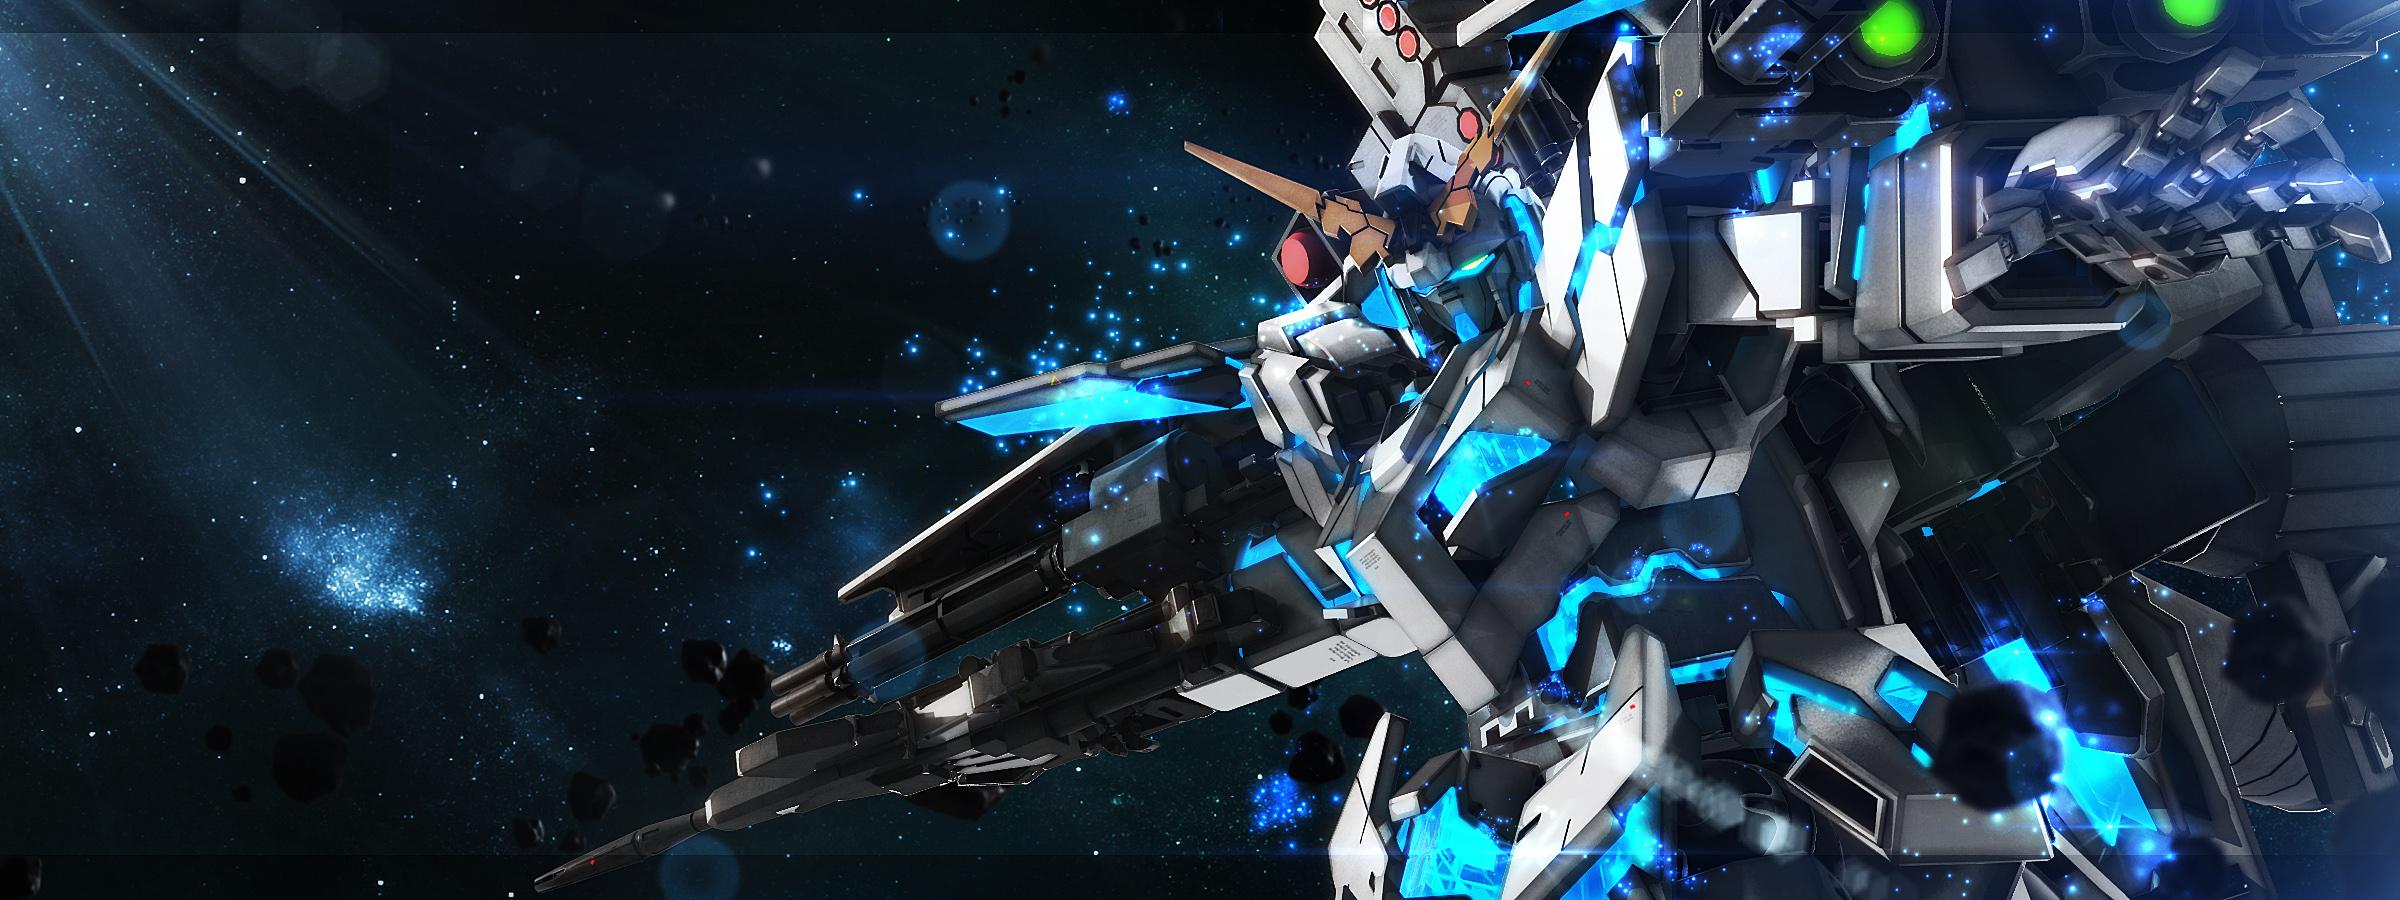 Gundam Wallpaper 12 Cool Wallpaper - Animewp.com